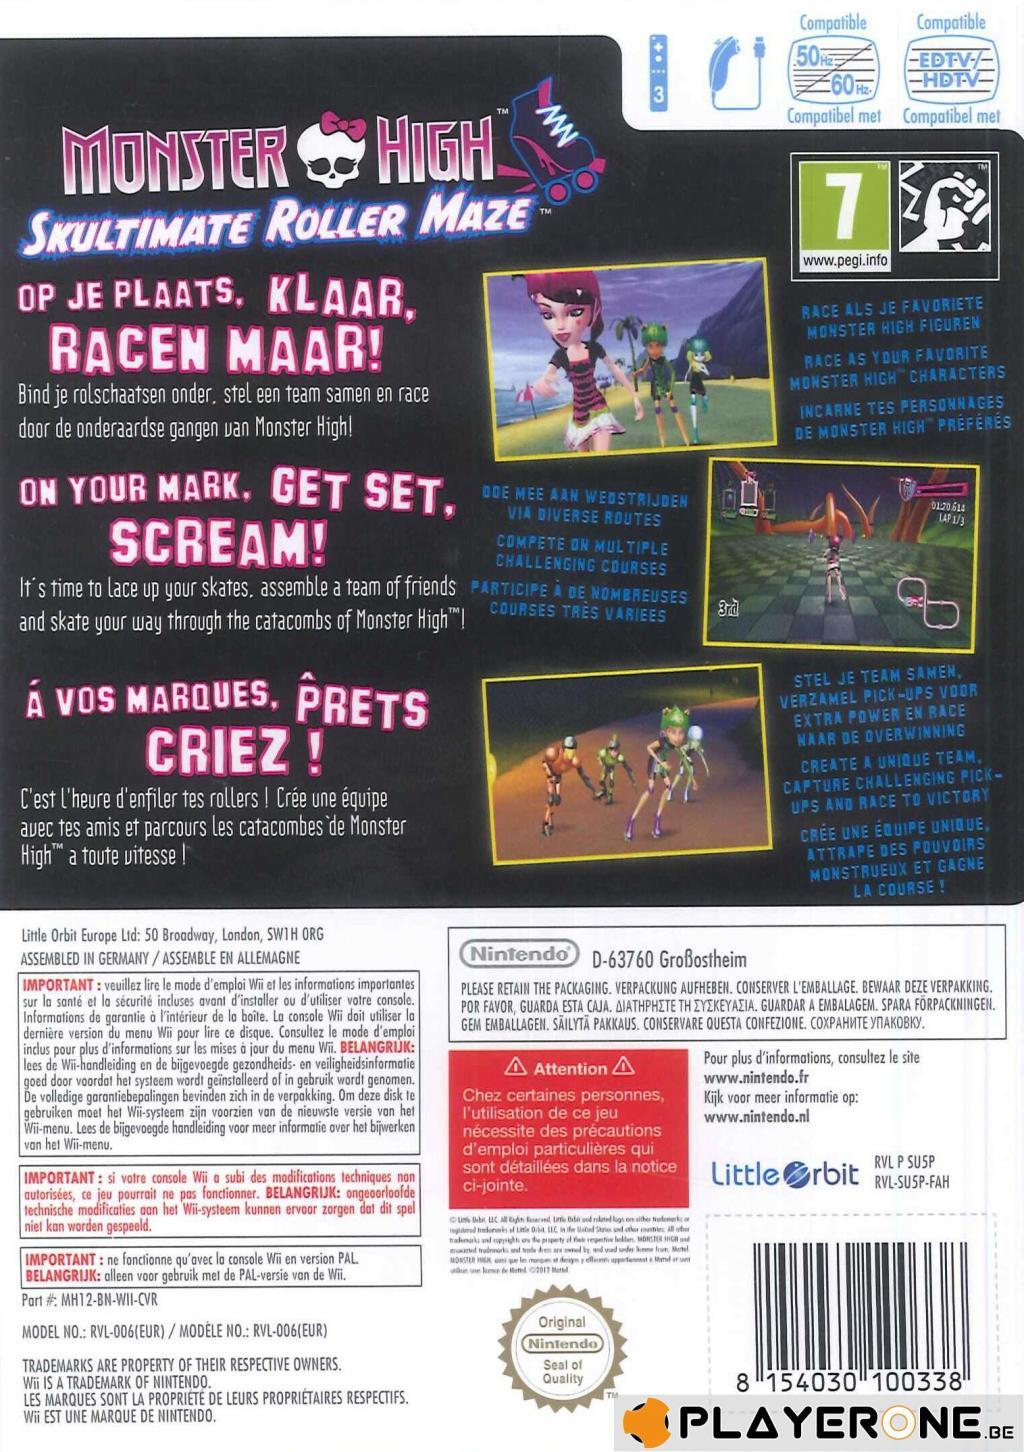 Monster High : Course de Rollers Incroyablemenbt Monstrueuse_2